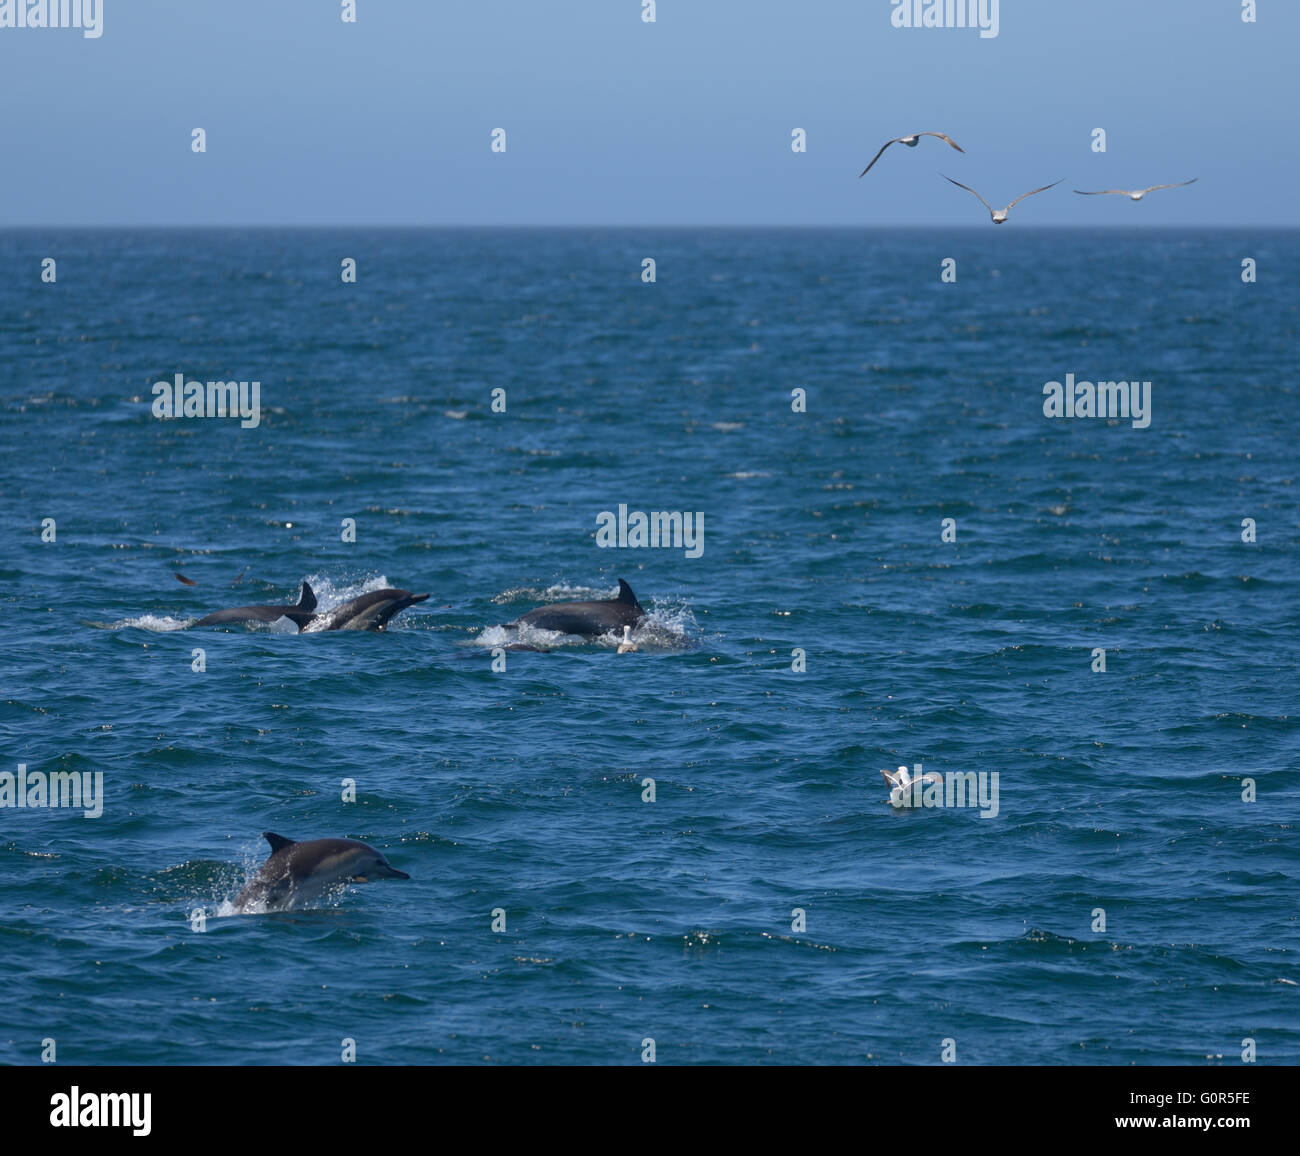 Wild Dolphins in Monterey Bay, CA - Stock Image